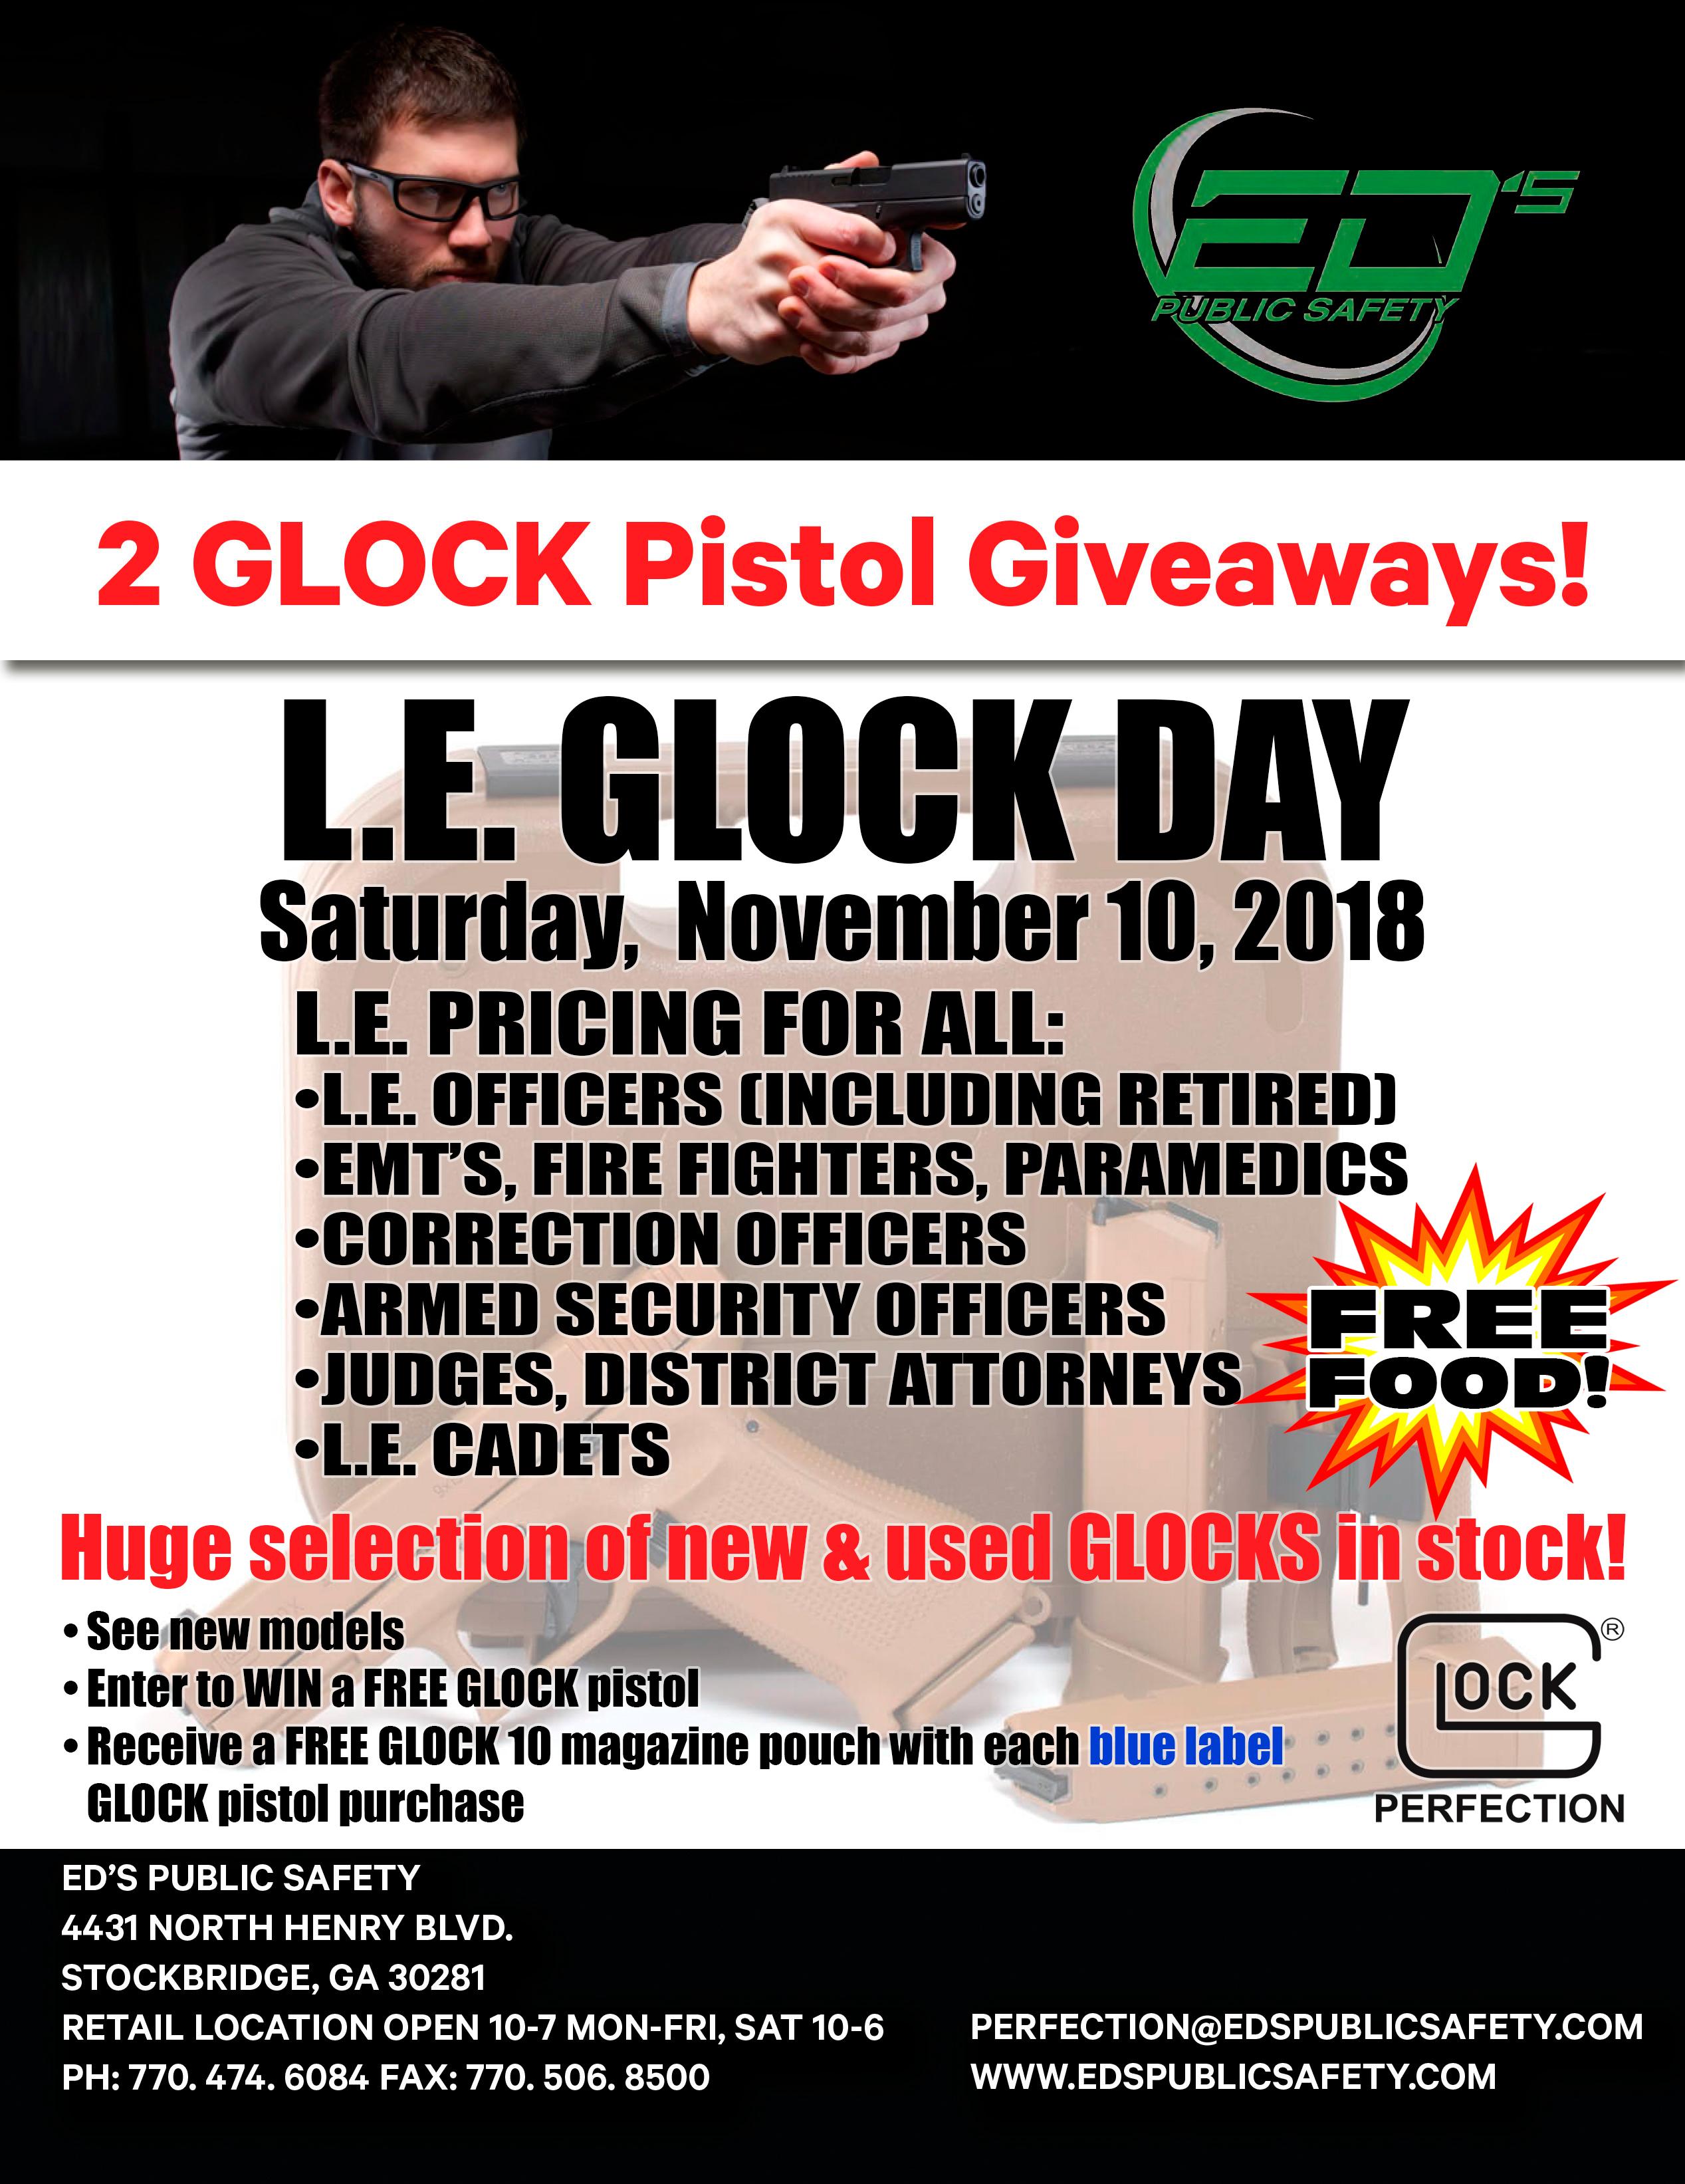 Glock Day - Saturday, November 10